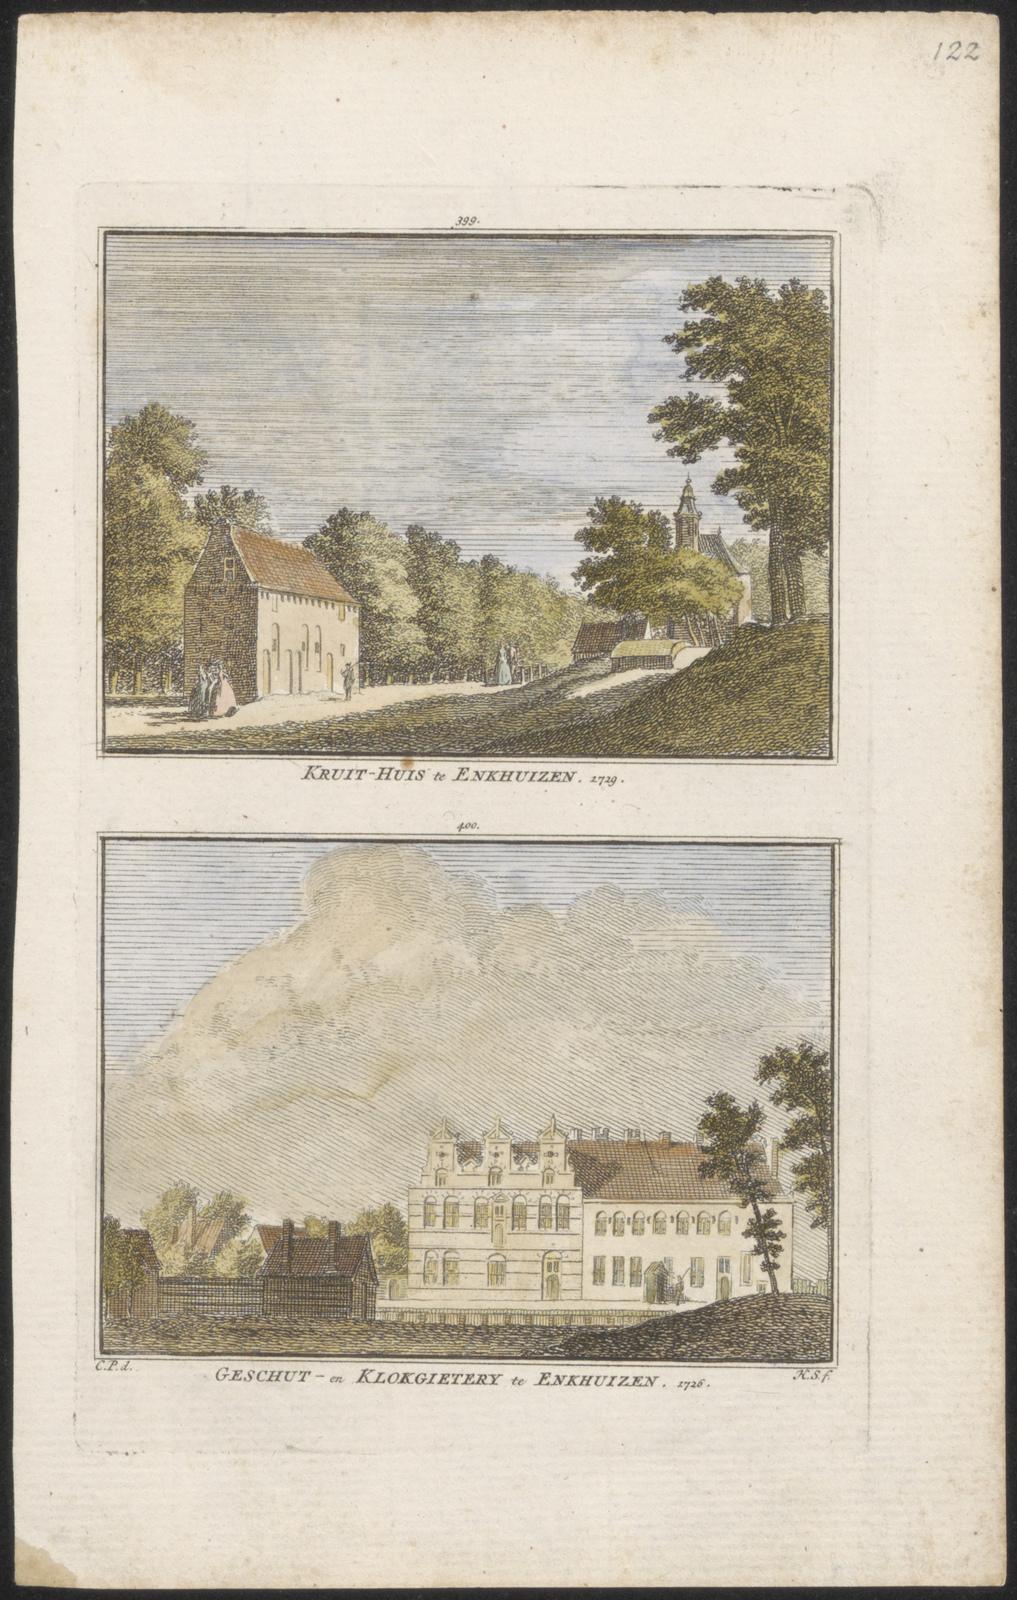 Kruithuis te Enkhuizen 1729 Geschut- en klokgietery te Enkhuizen1726